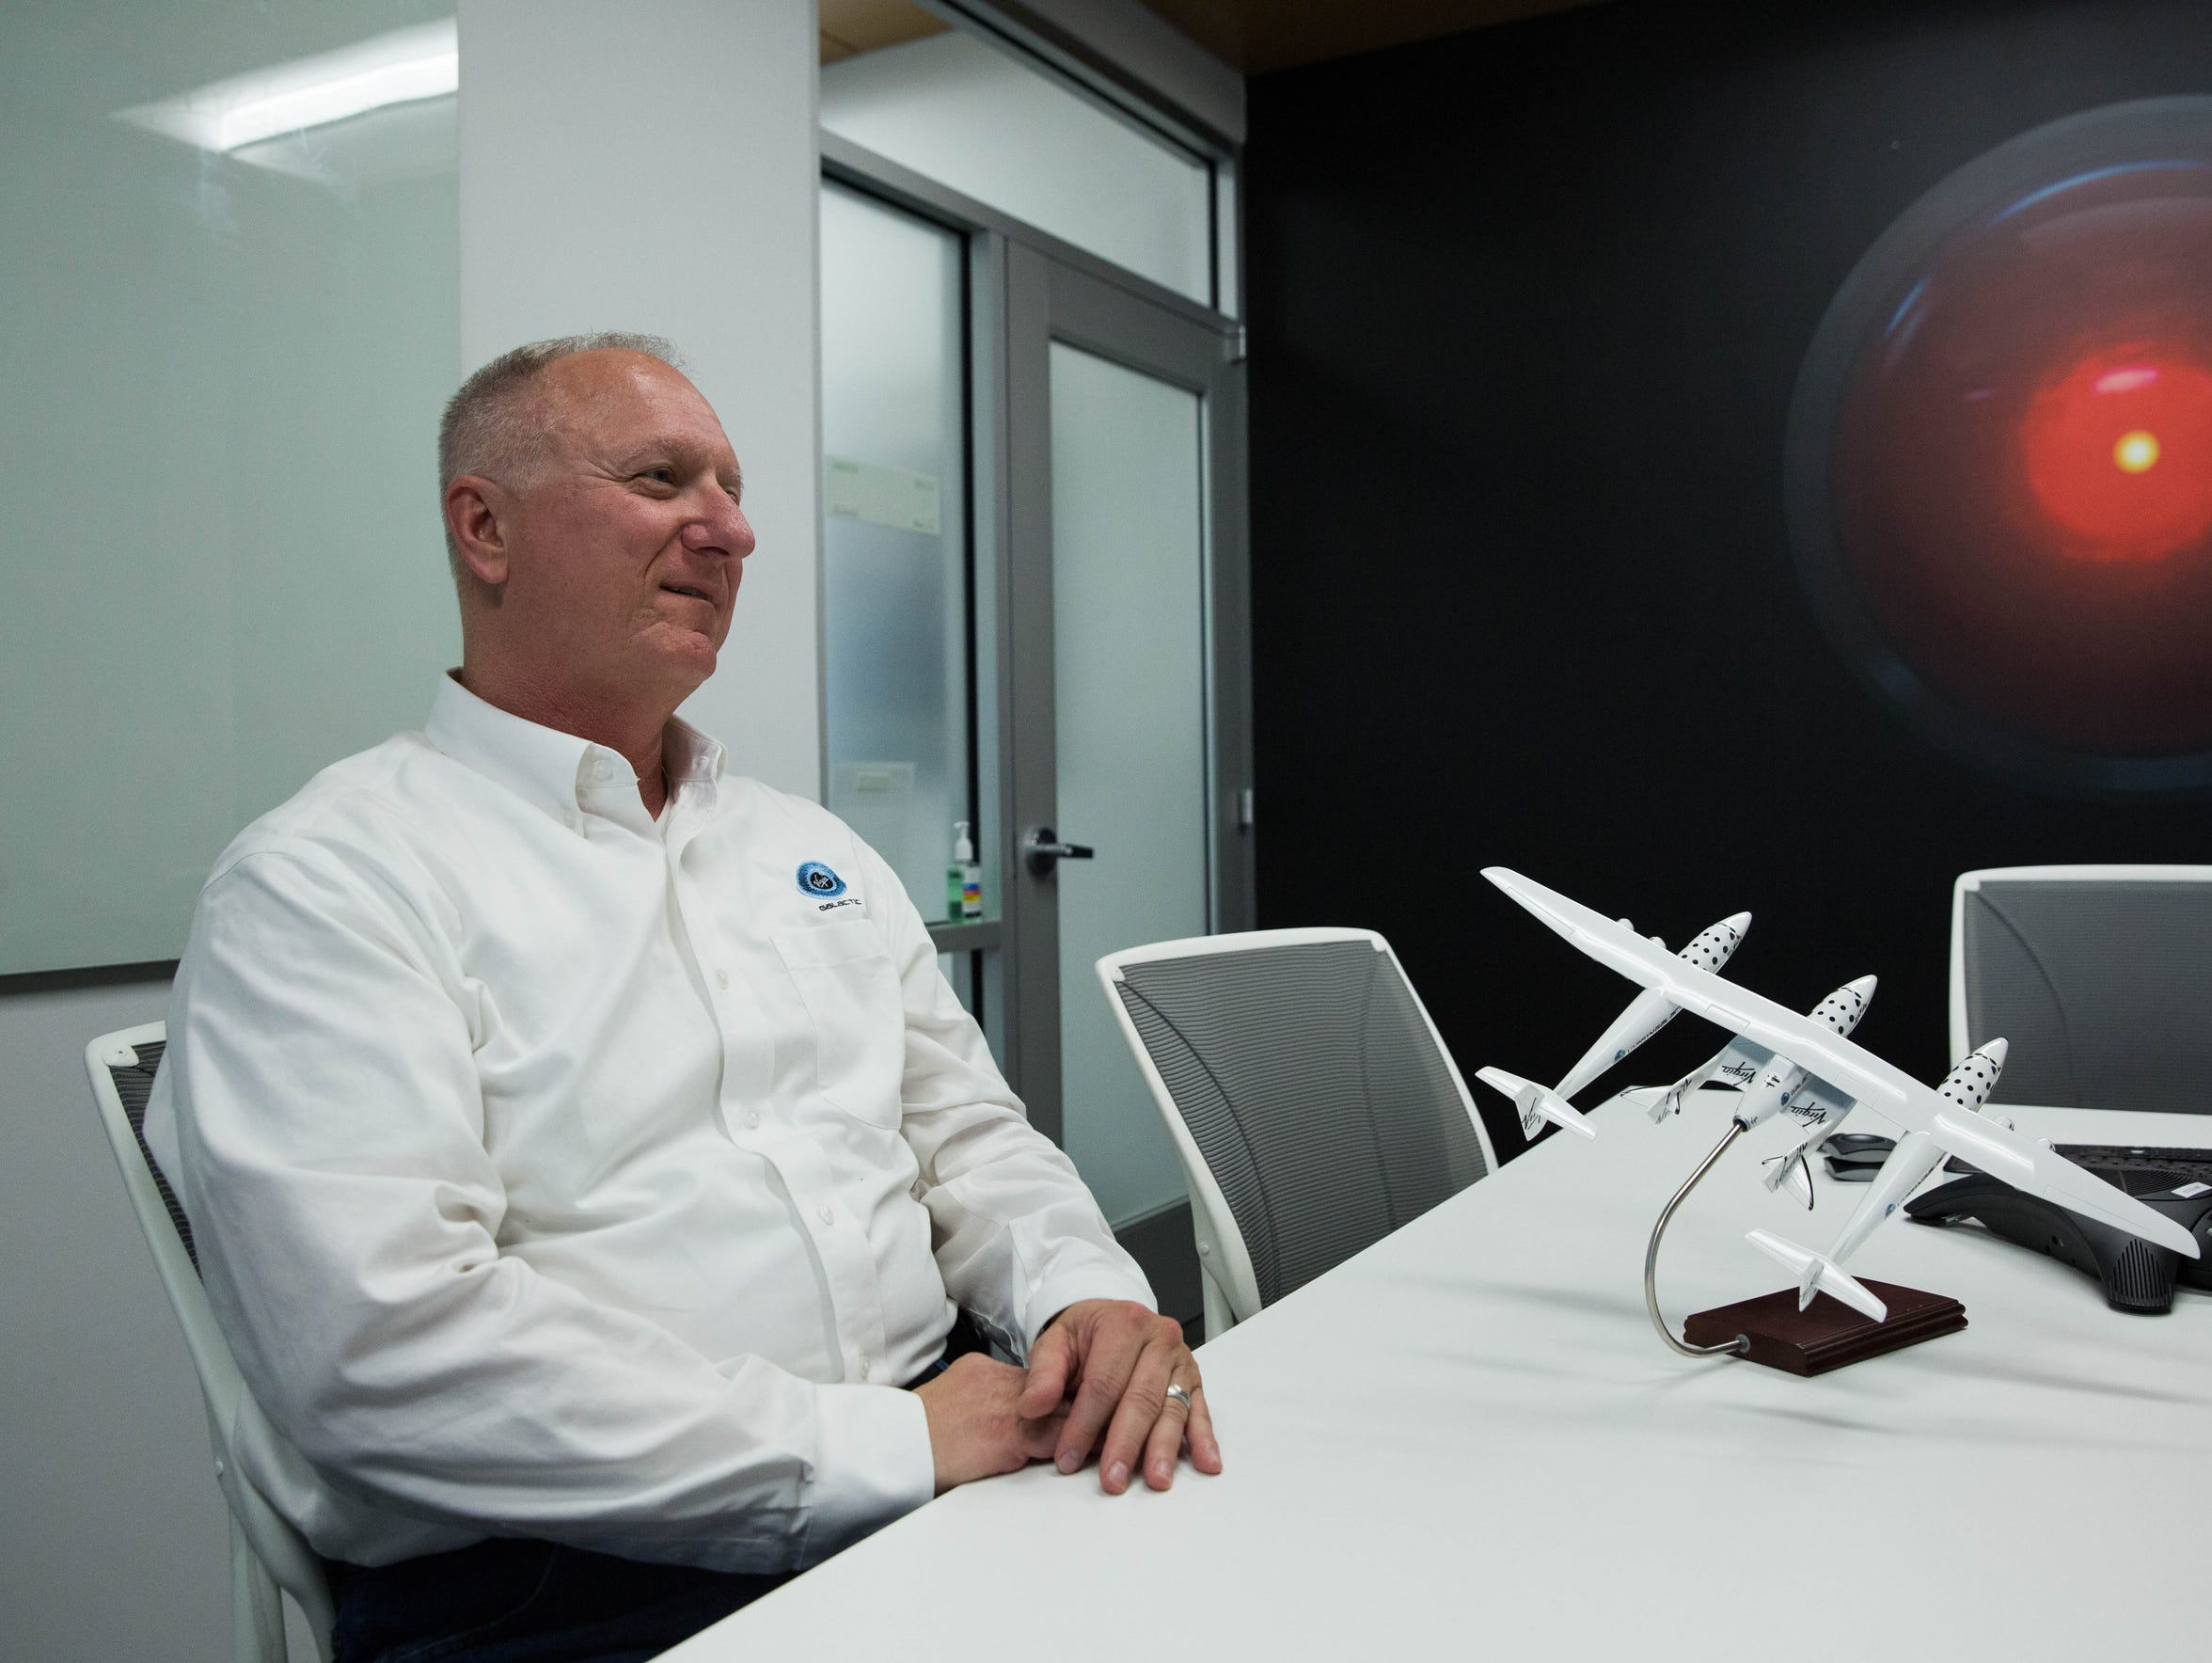 Pete Nickolenko, chief engineer for Virgin Galactic,